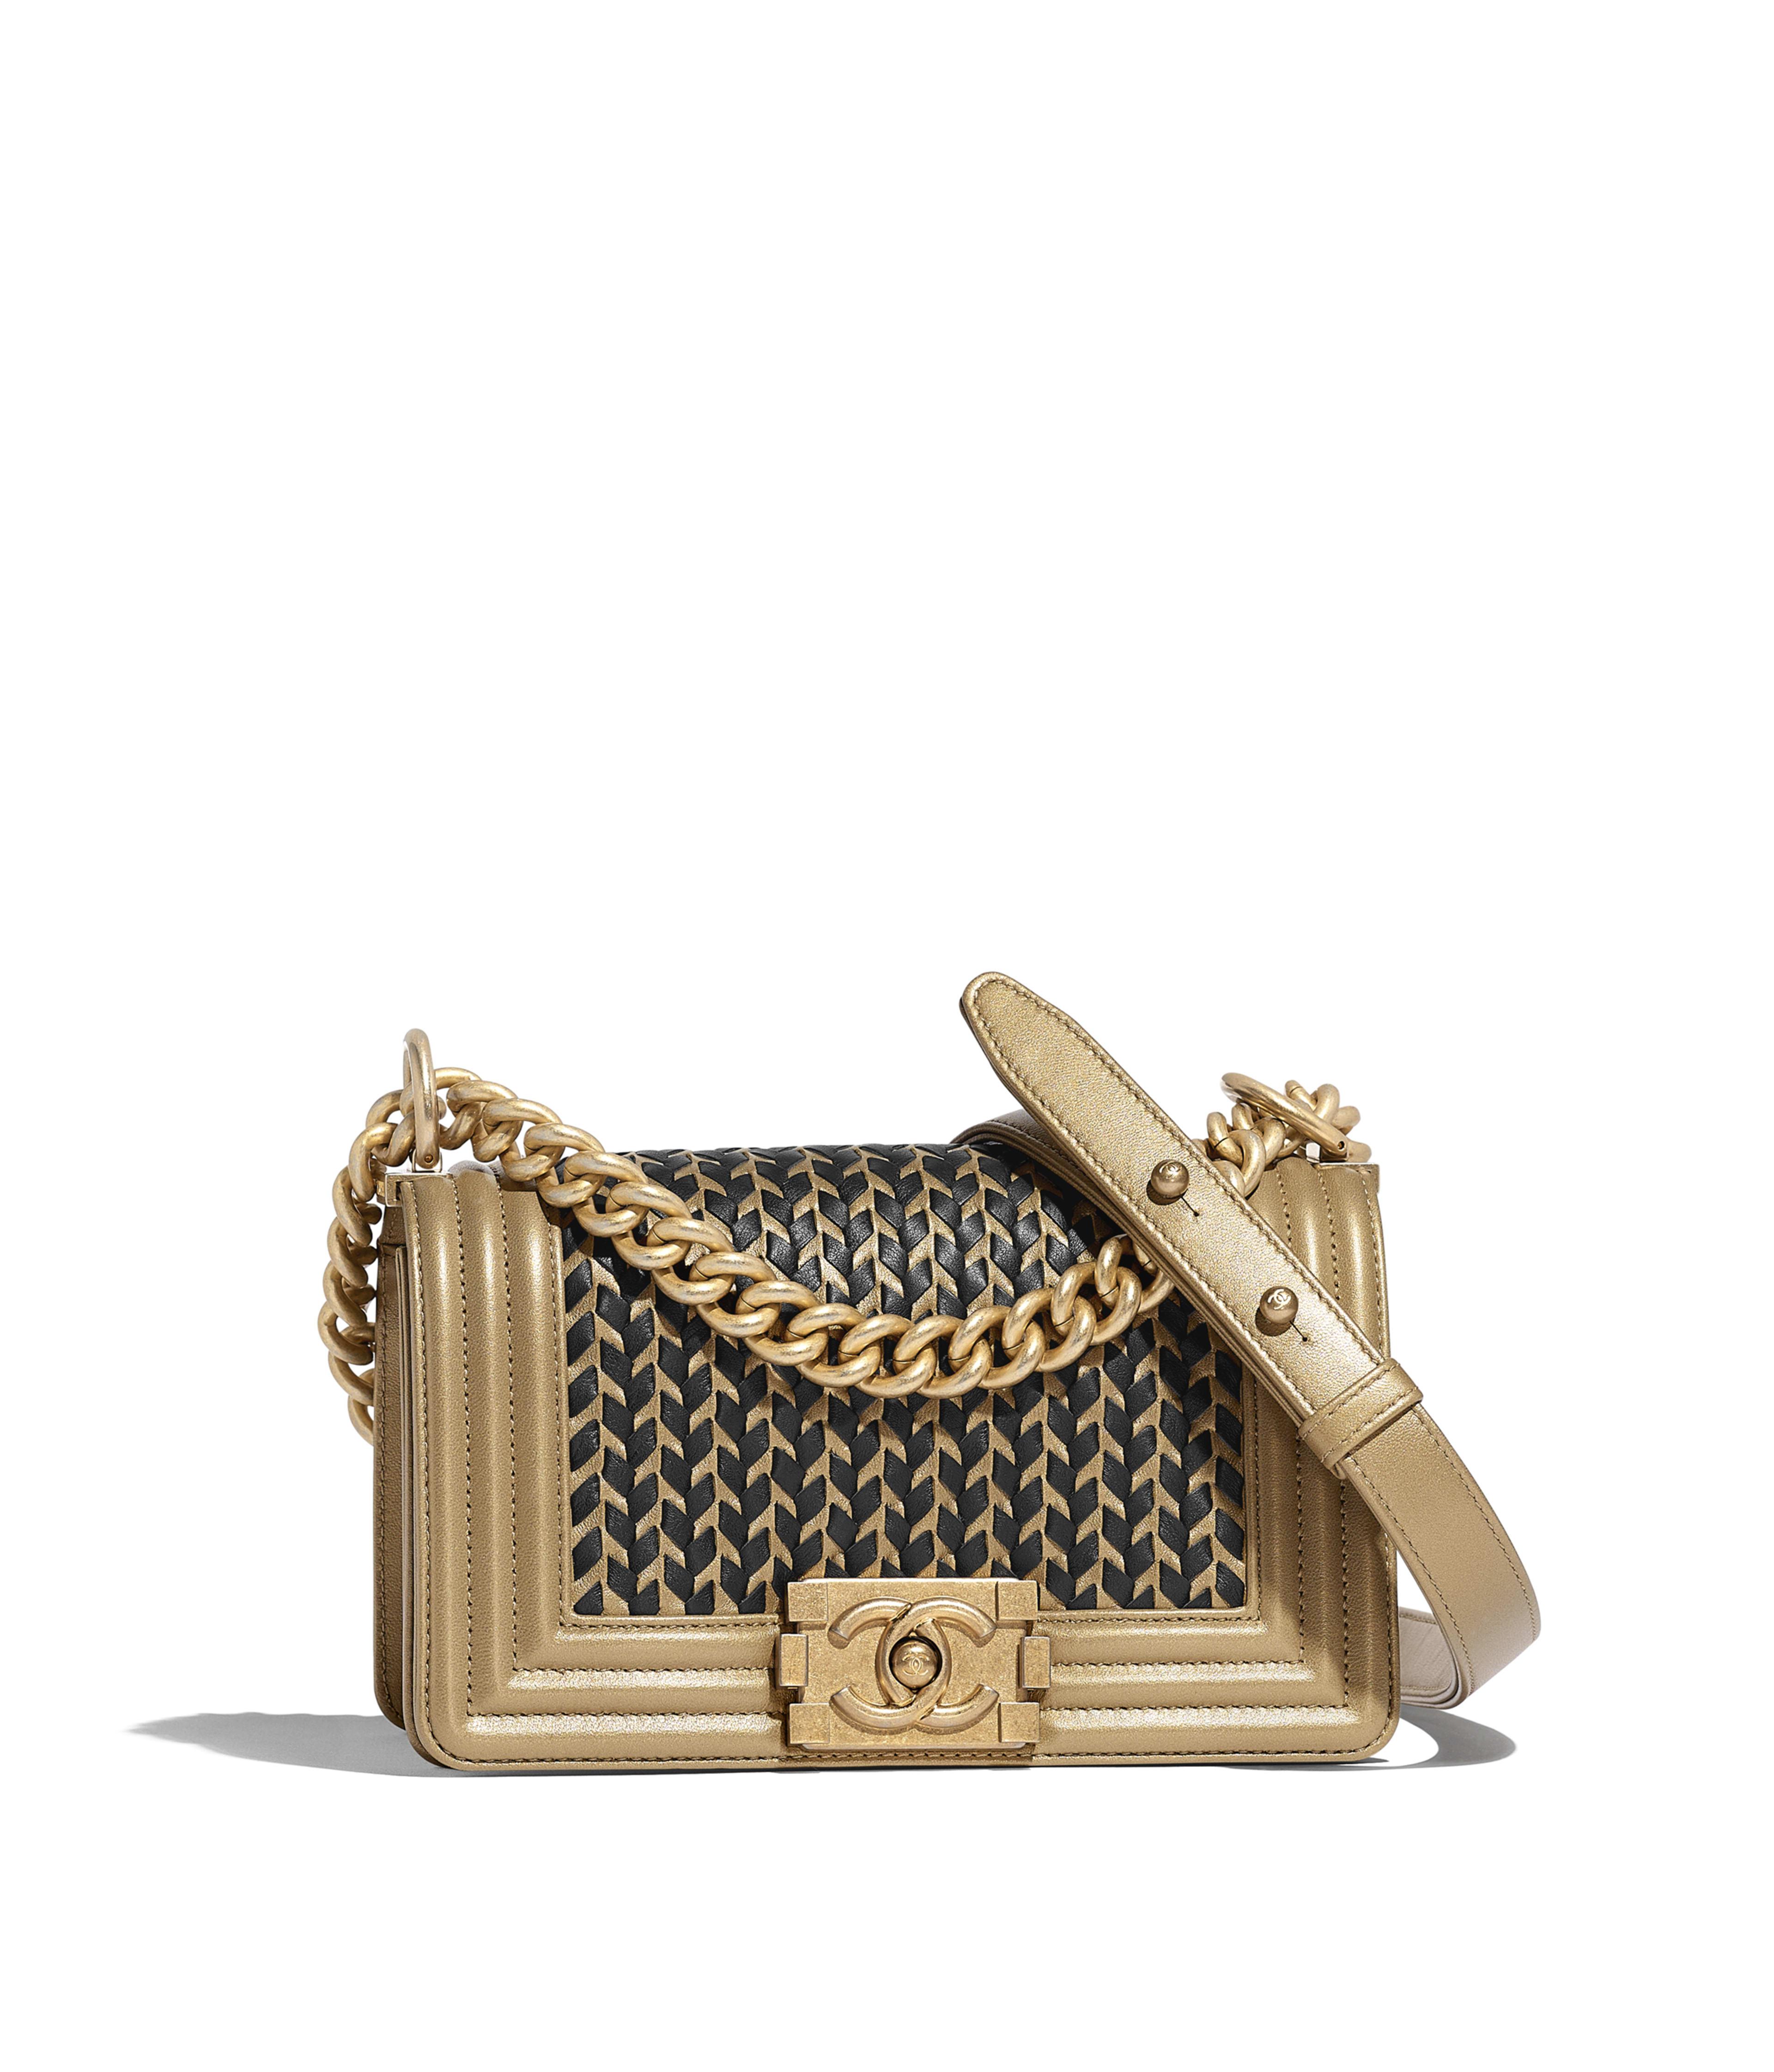 345043dfbeab Small BOY CHANEL Handbag Metallic Lambskin & Gold-Tone Metal, Gold & Black  Ref. A67085B00698N4738